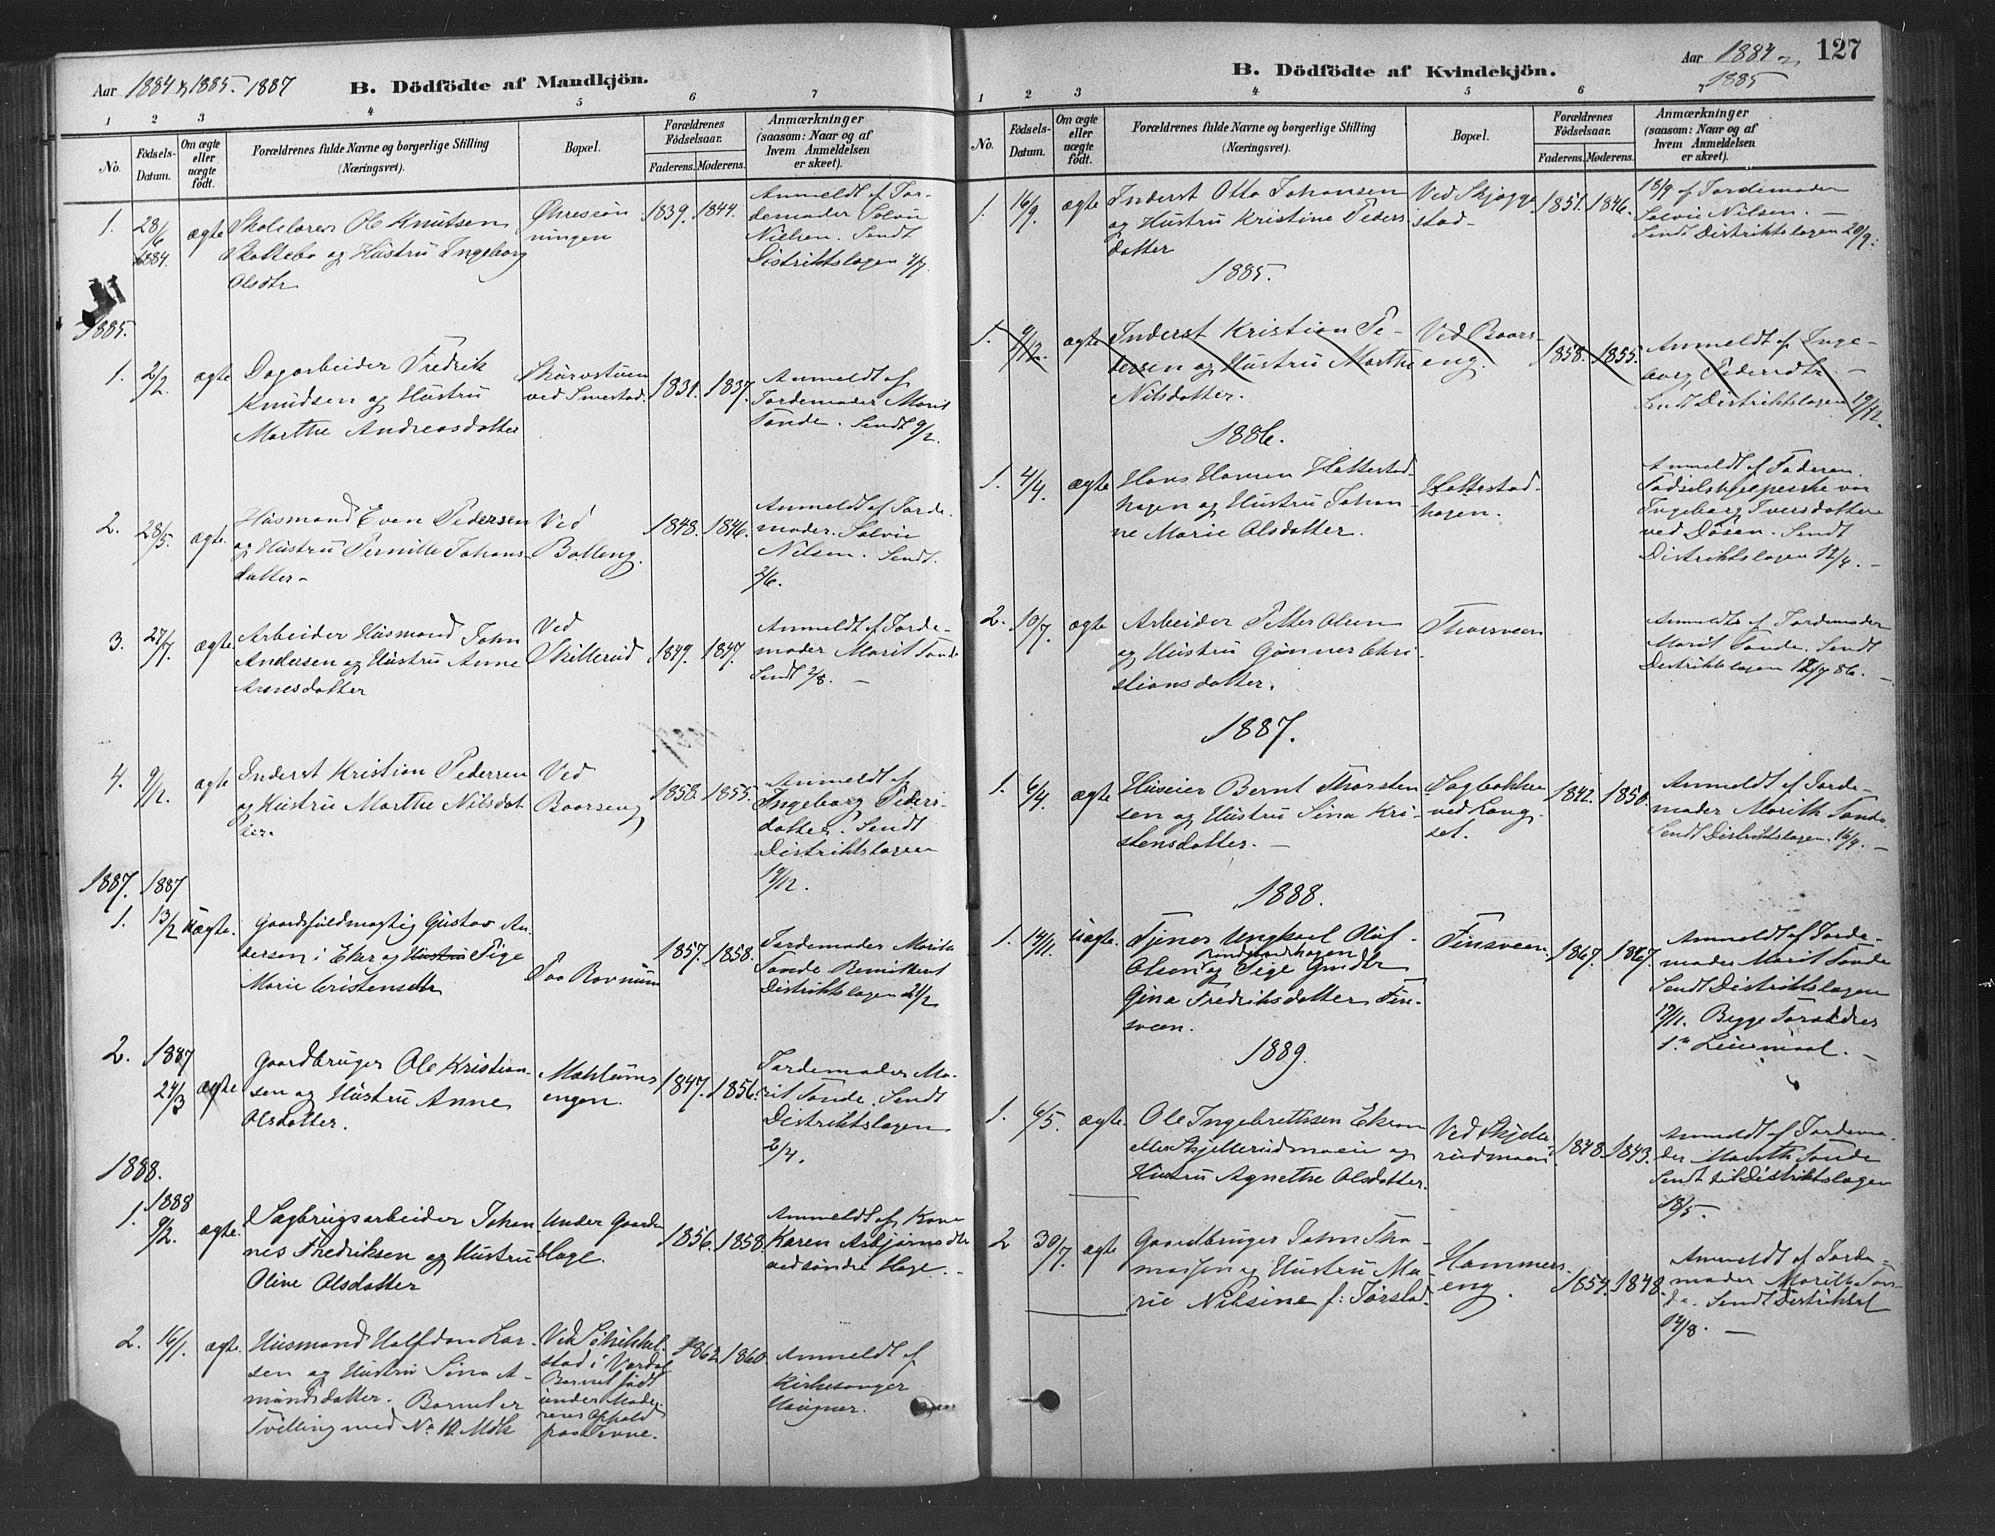 SAH, Fåberg prestekontor, Ministerialbok nr. 9, 1879-1898, s. 127